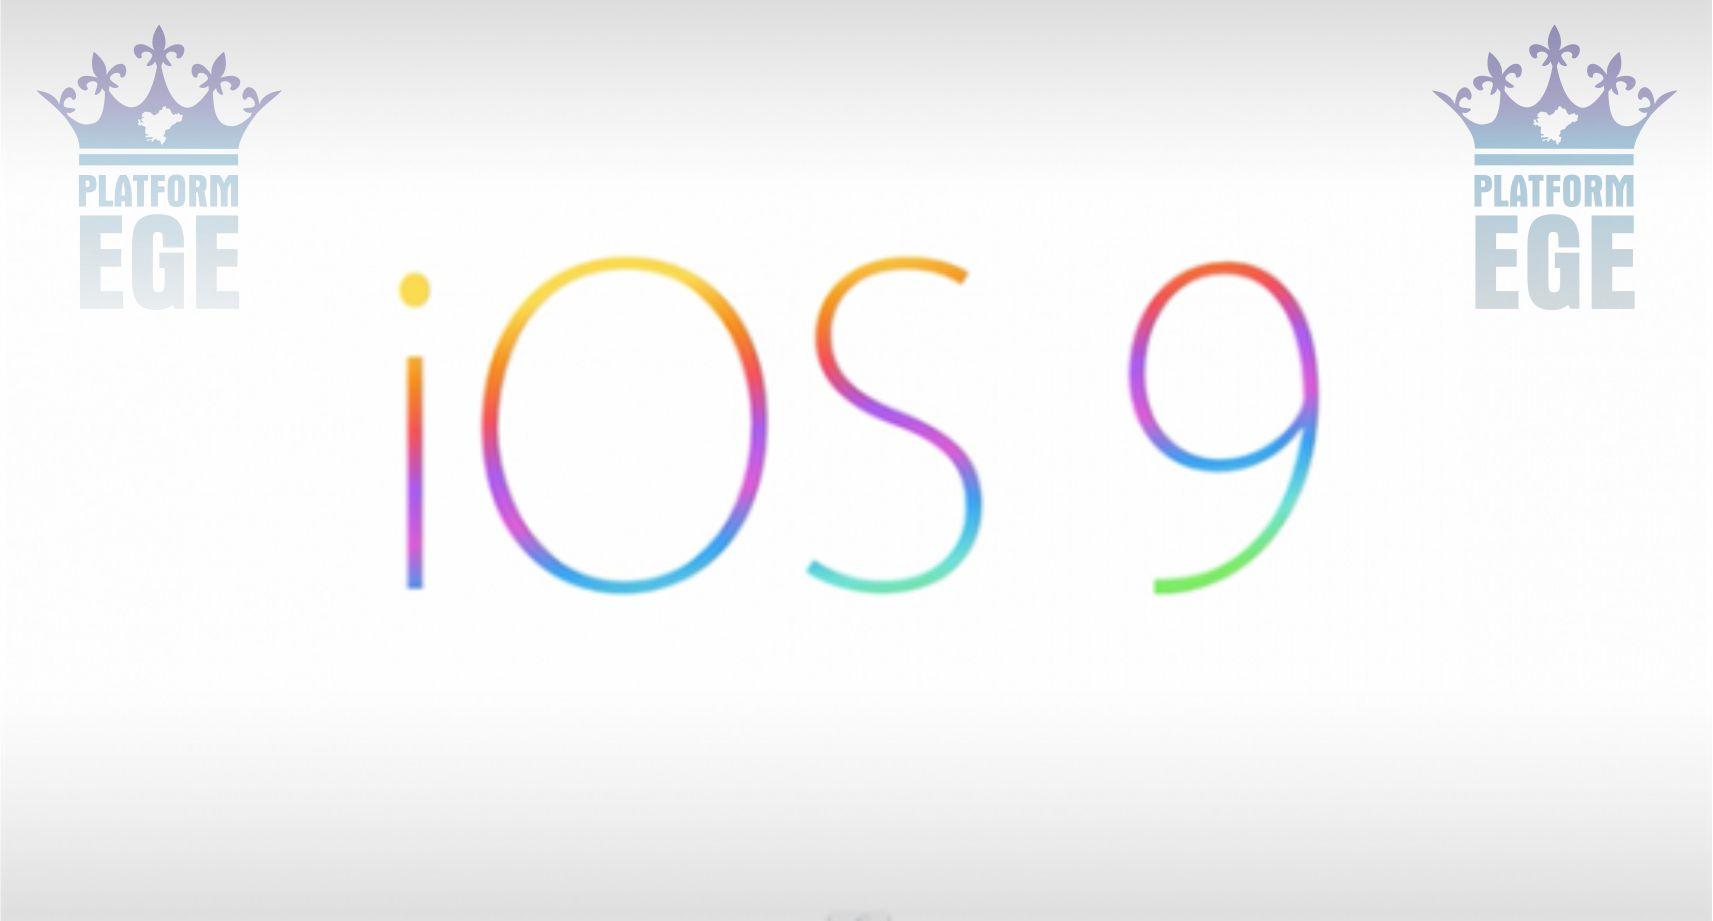 ios9-logo-poging2-16x90